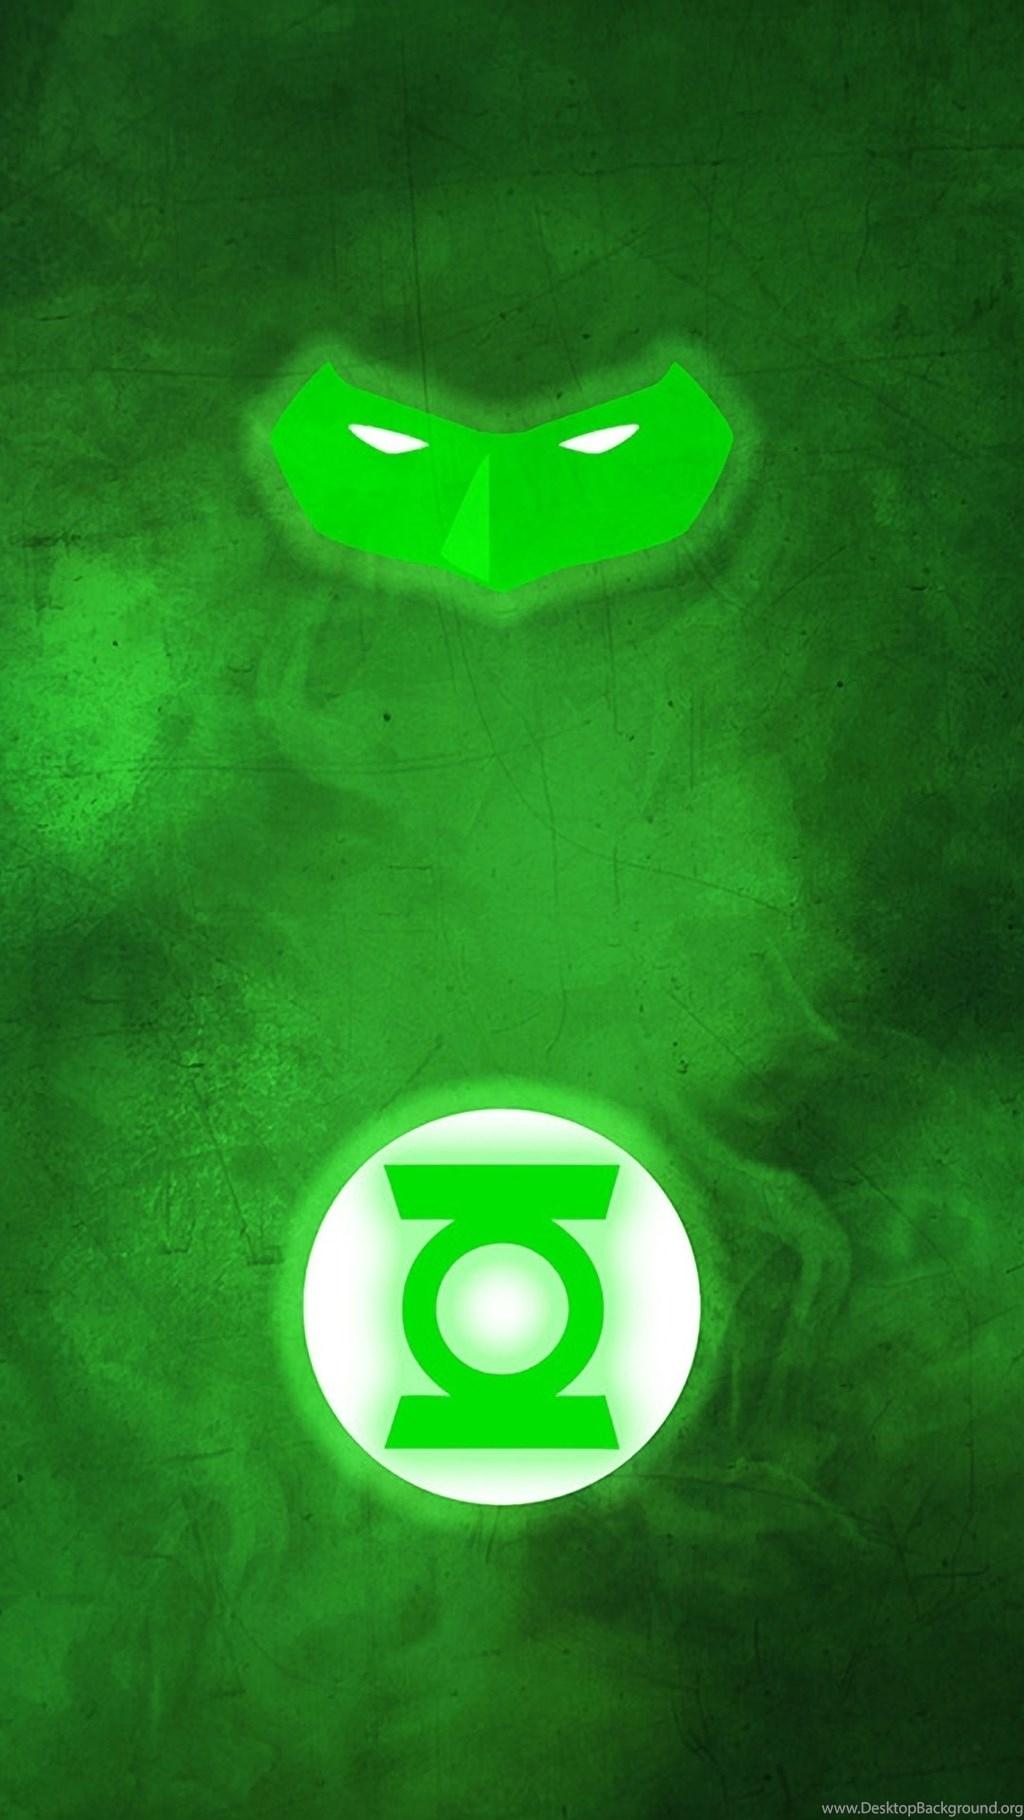 green lantern iphone iphone 6 plus wallpapers desktop background